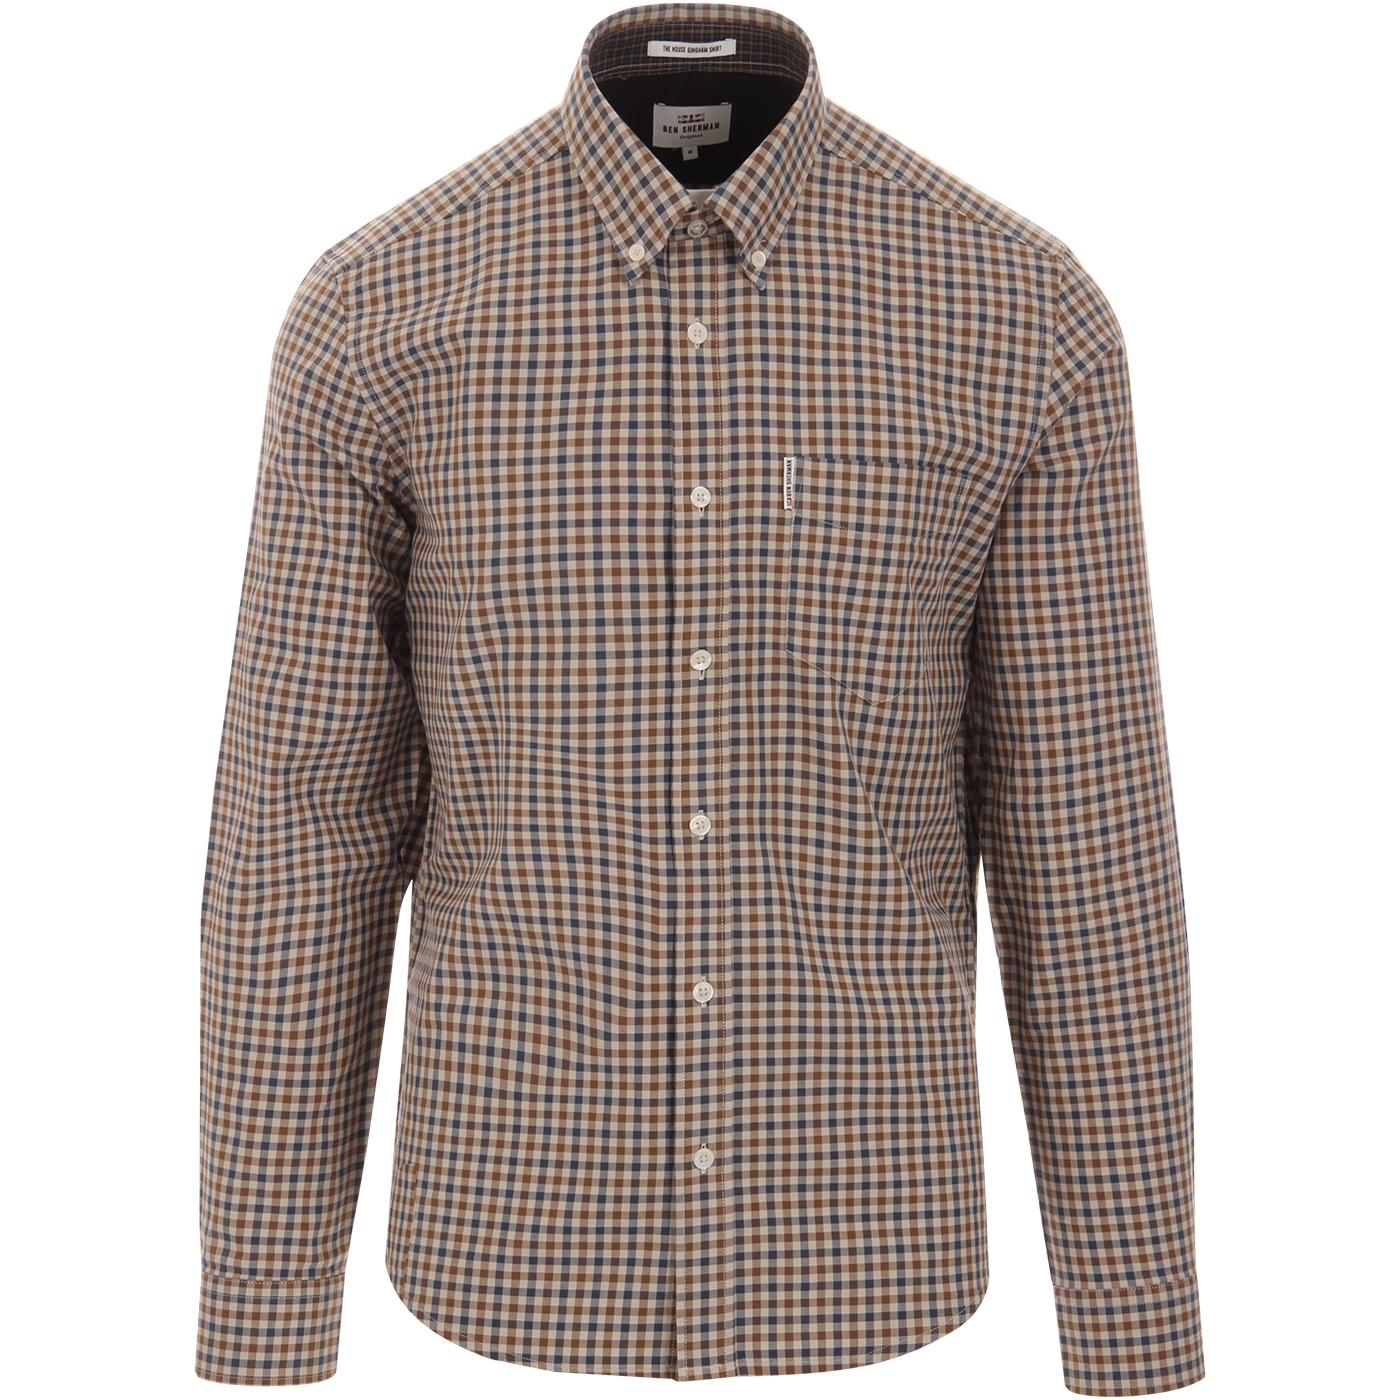 BEN SHERMAN Retro Mod House Check Gingham Shirt M